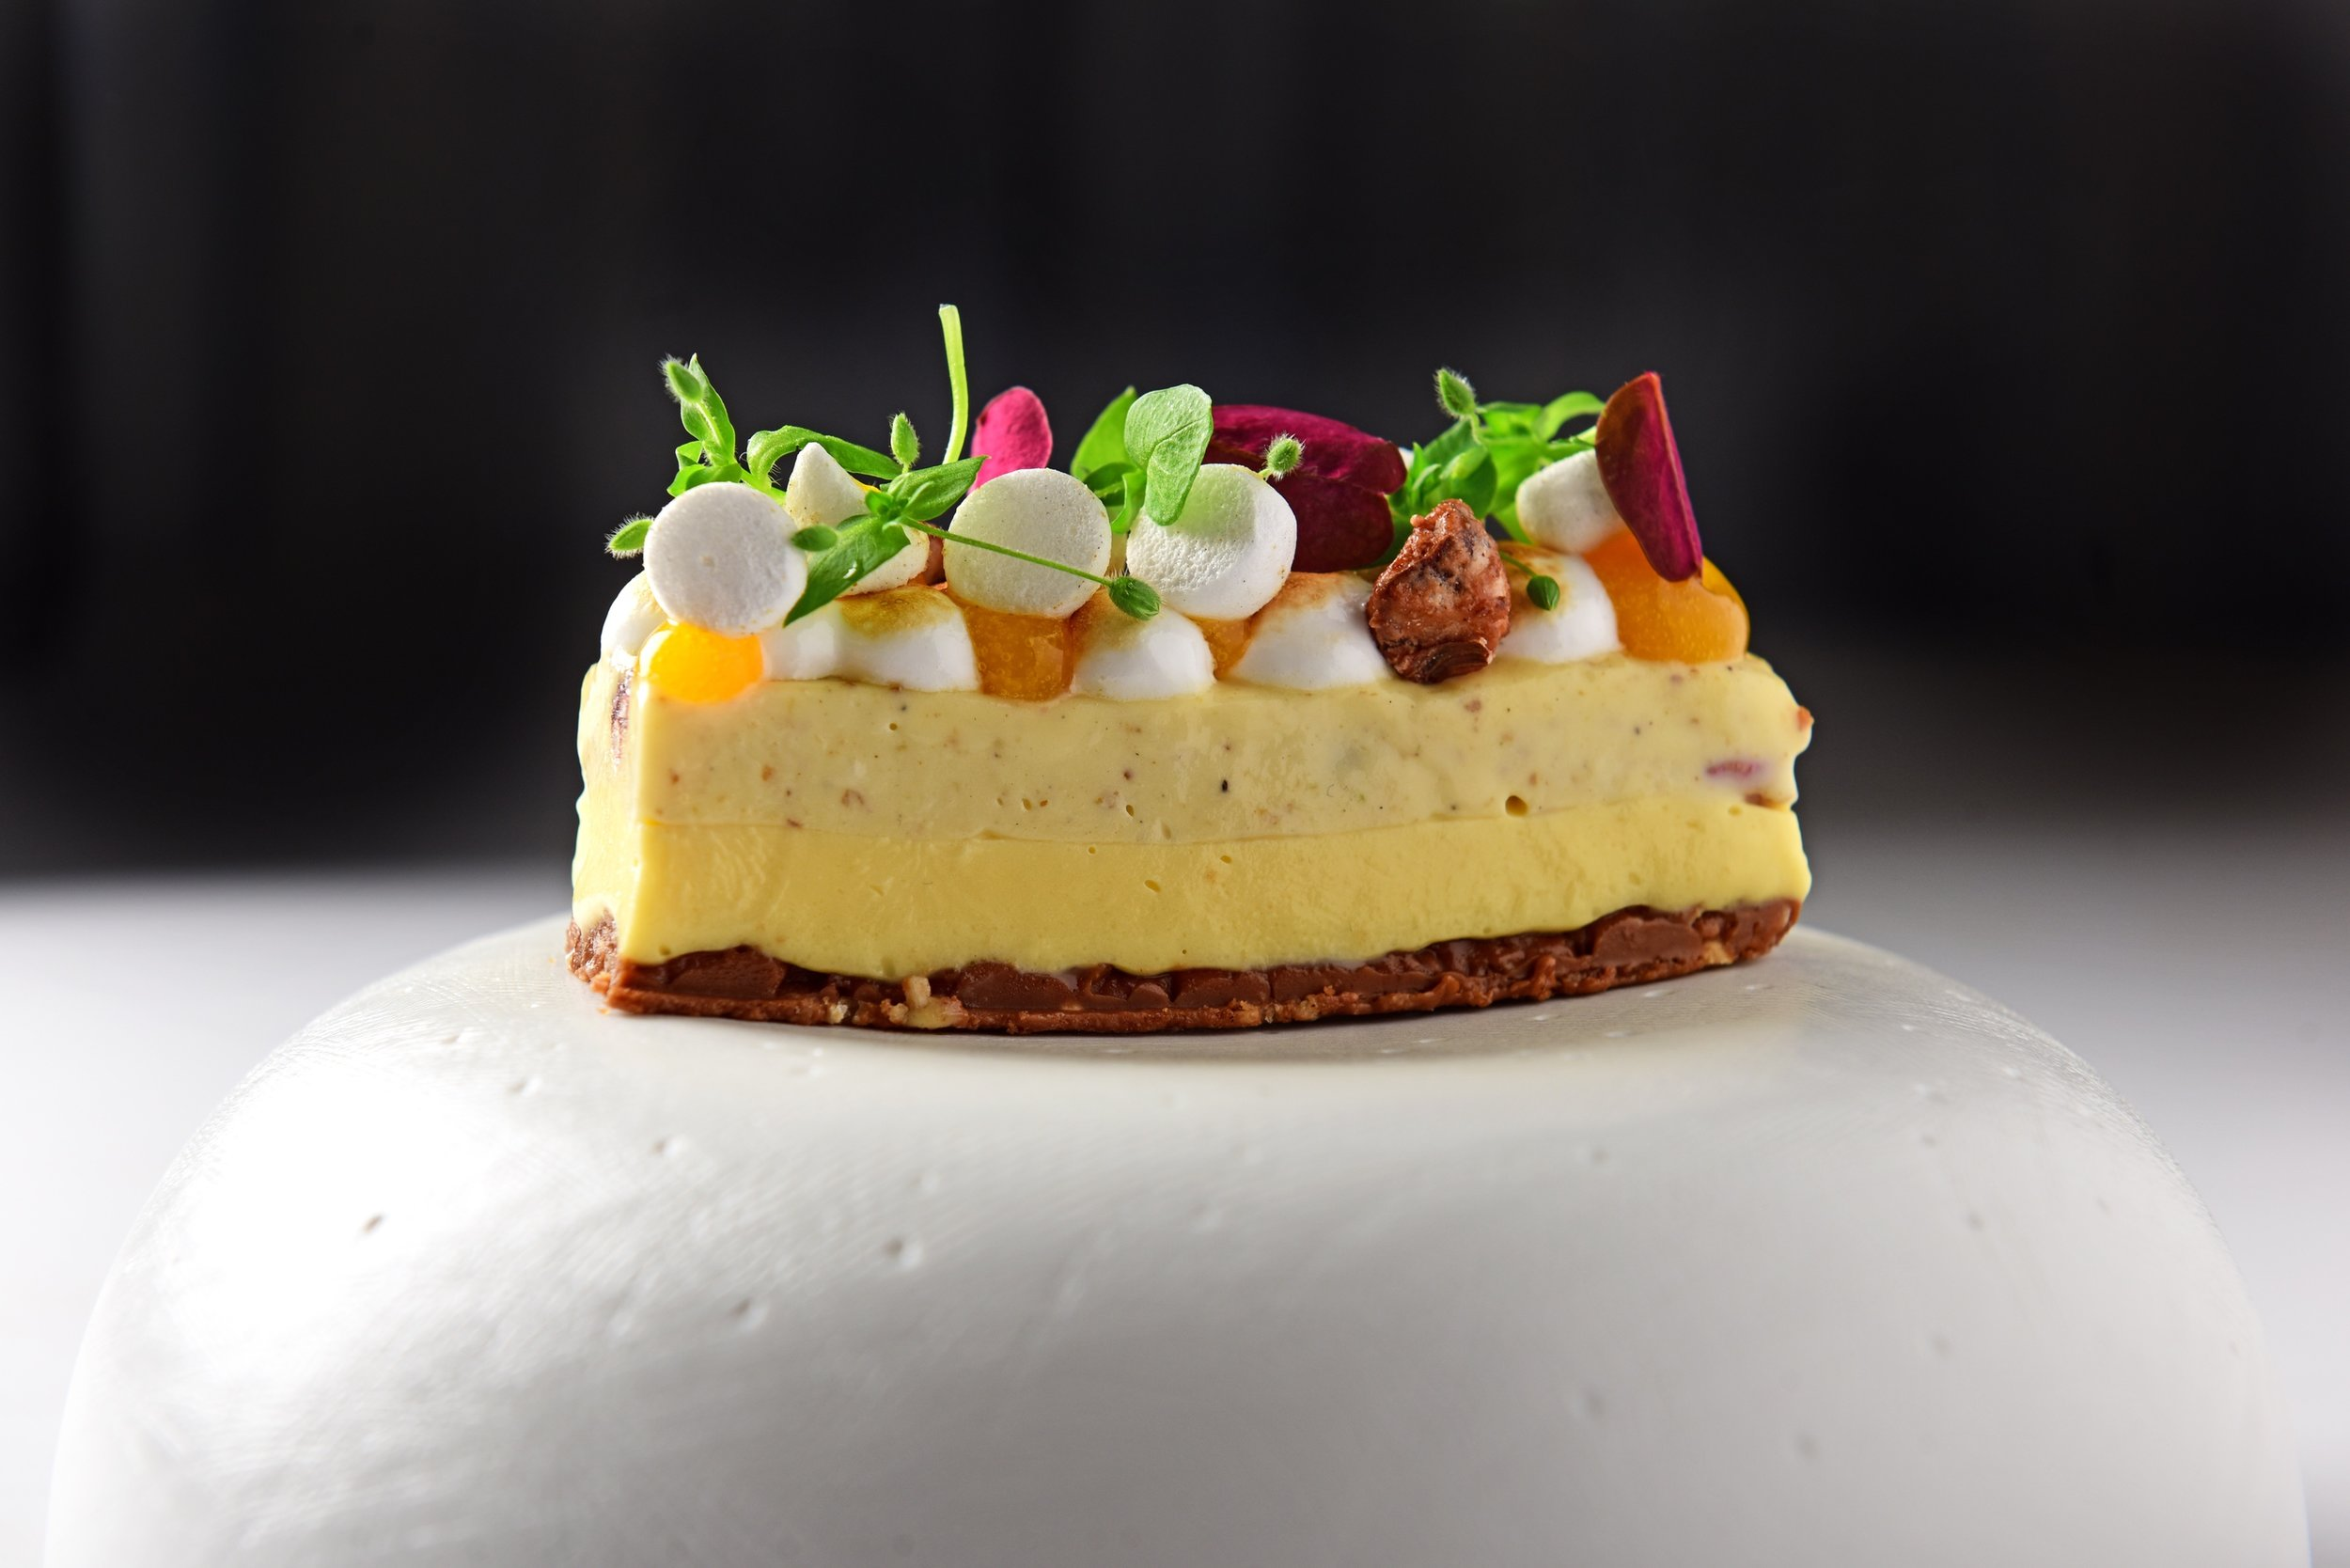 6 restaurant de bakermat ninove tablefever bart albrecht culinair fotograaf.jpg